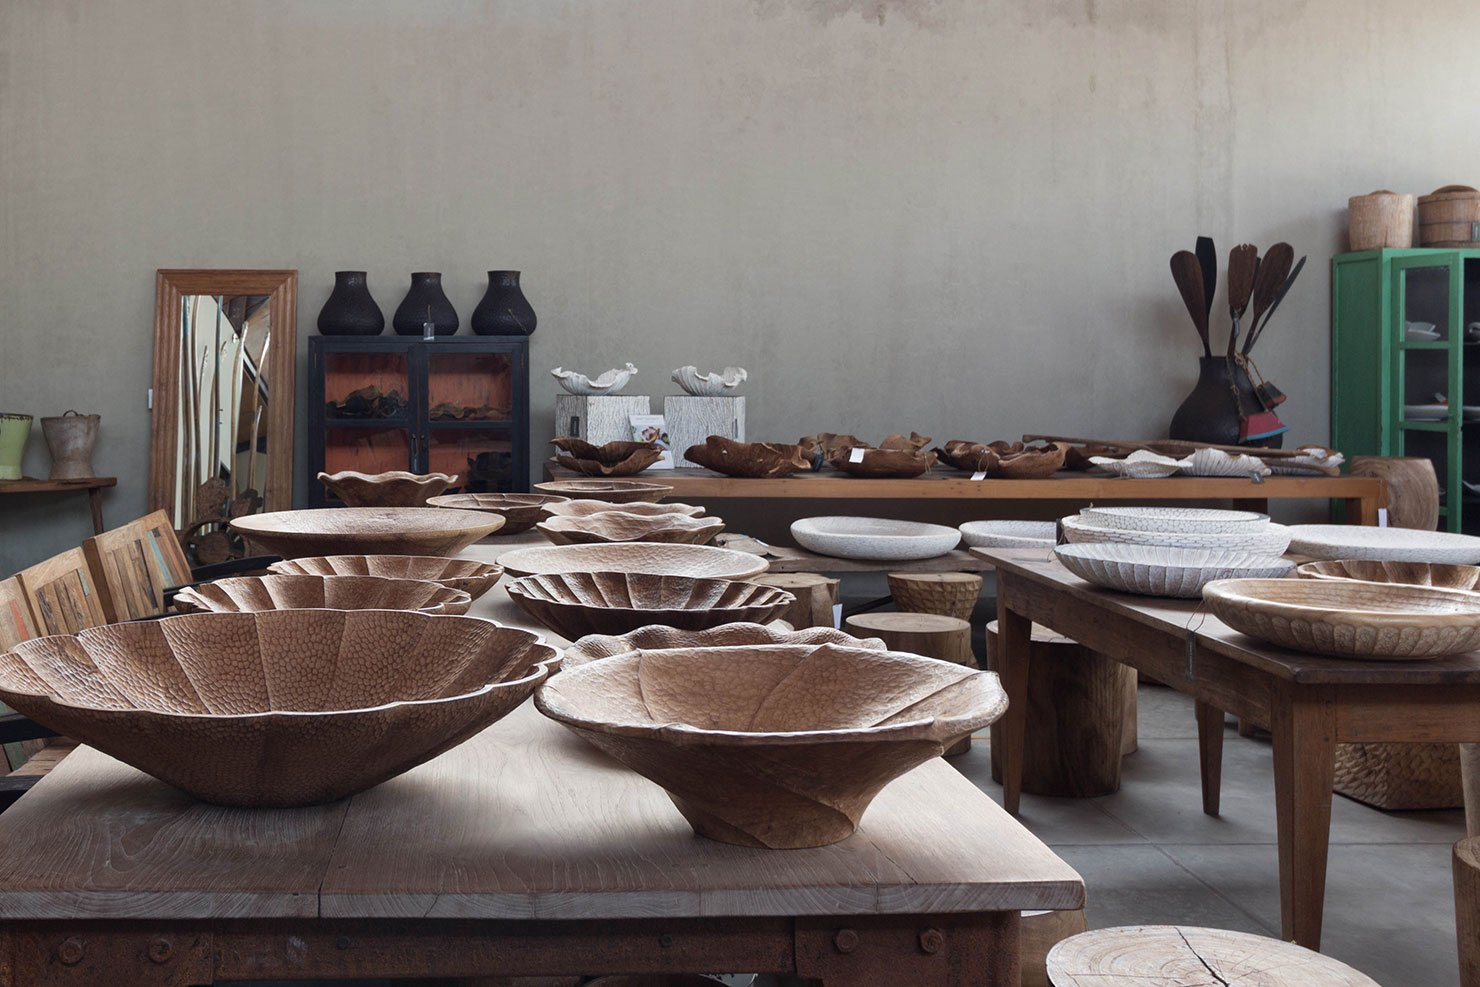 Bali interiors, craft district